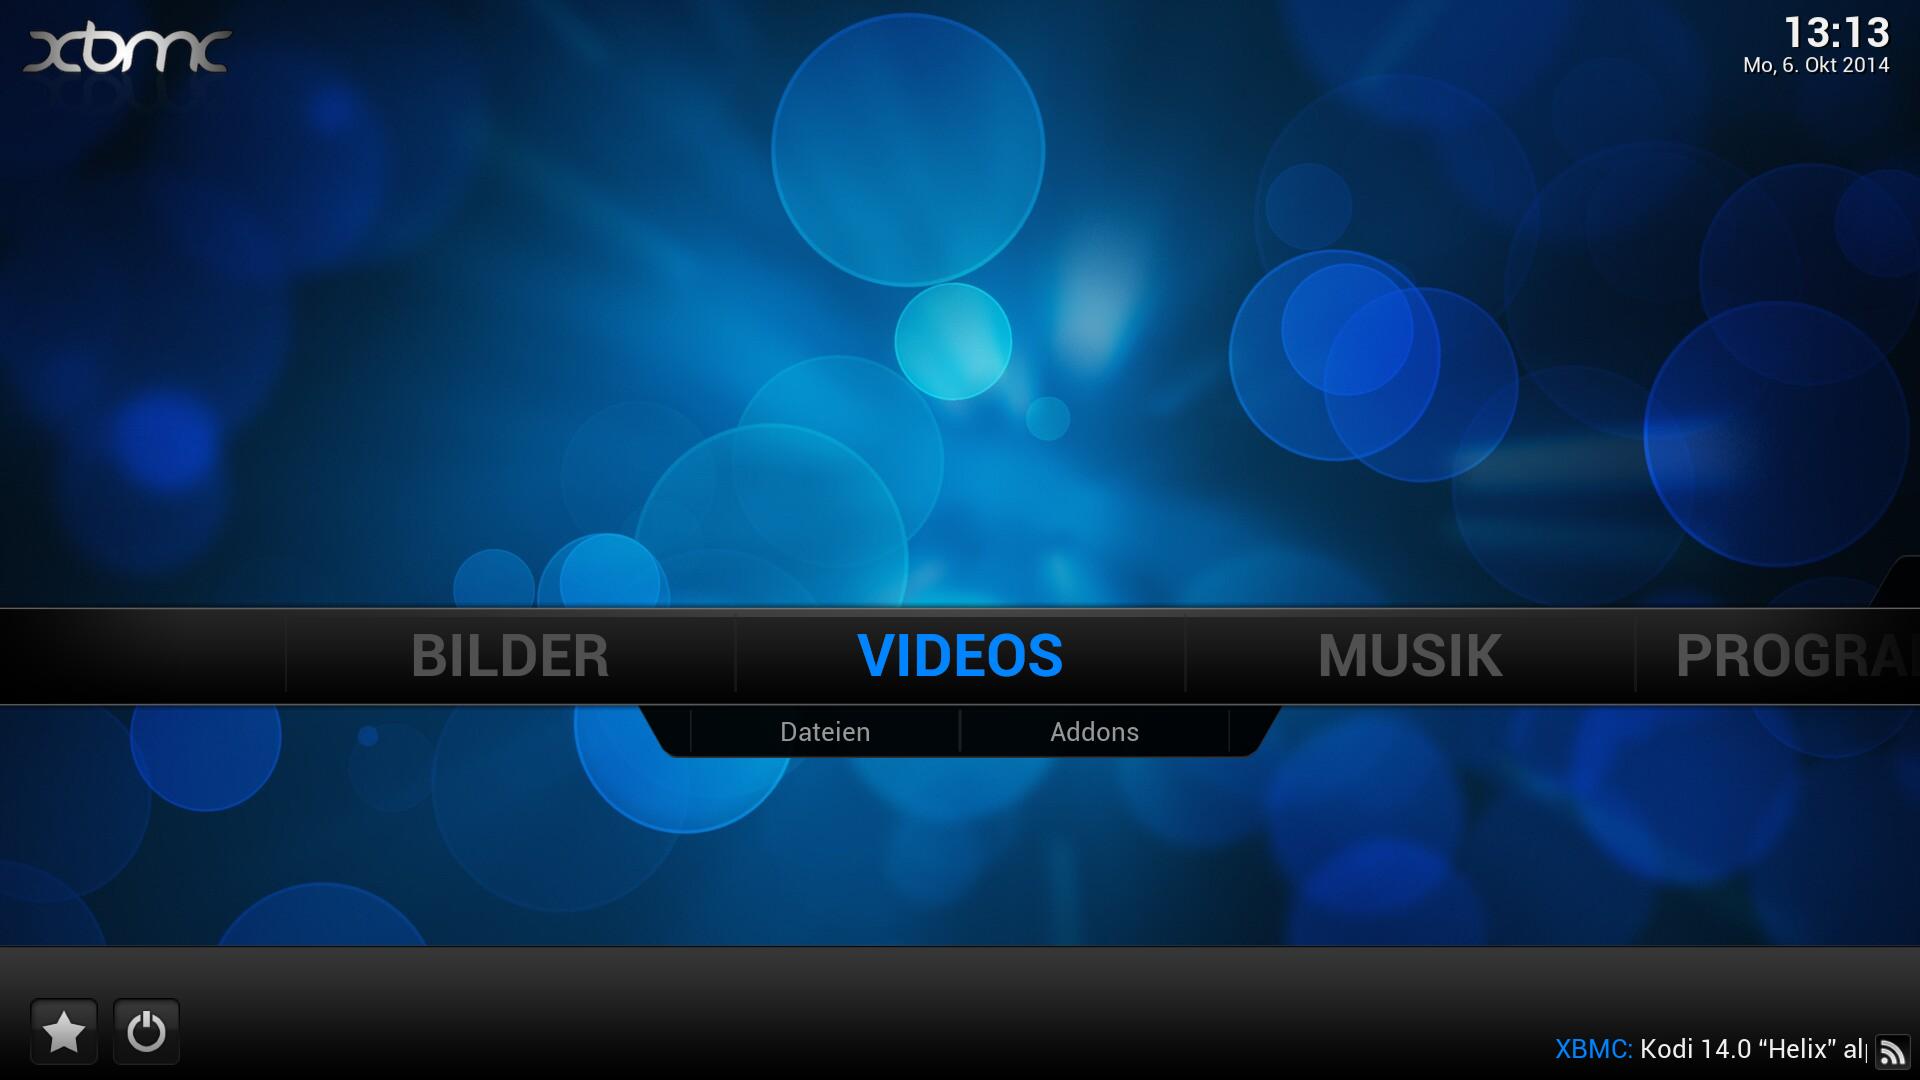 Workshop: Amazons Fire TV wird zur Multimedia-Zentrale - XBMC-Startbildschirm auf dem Fire TV (Screenshot: Golem.de)